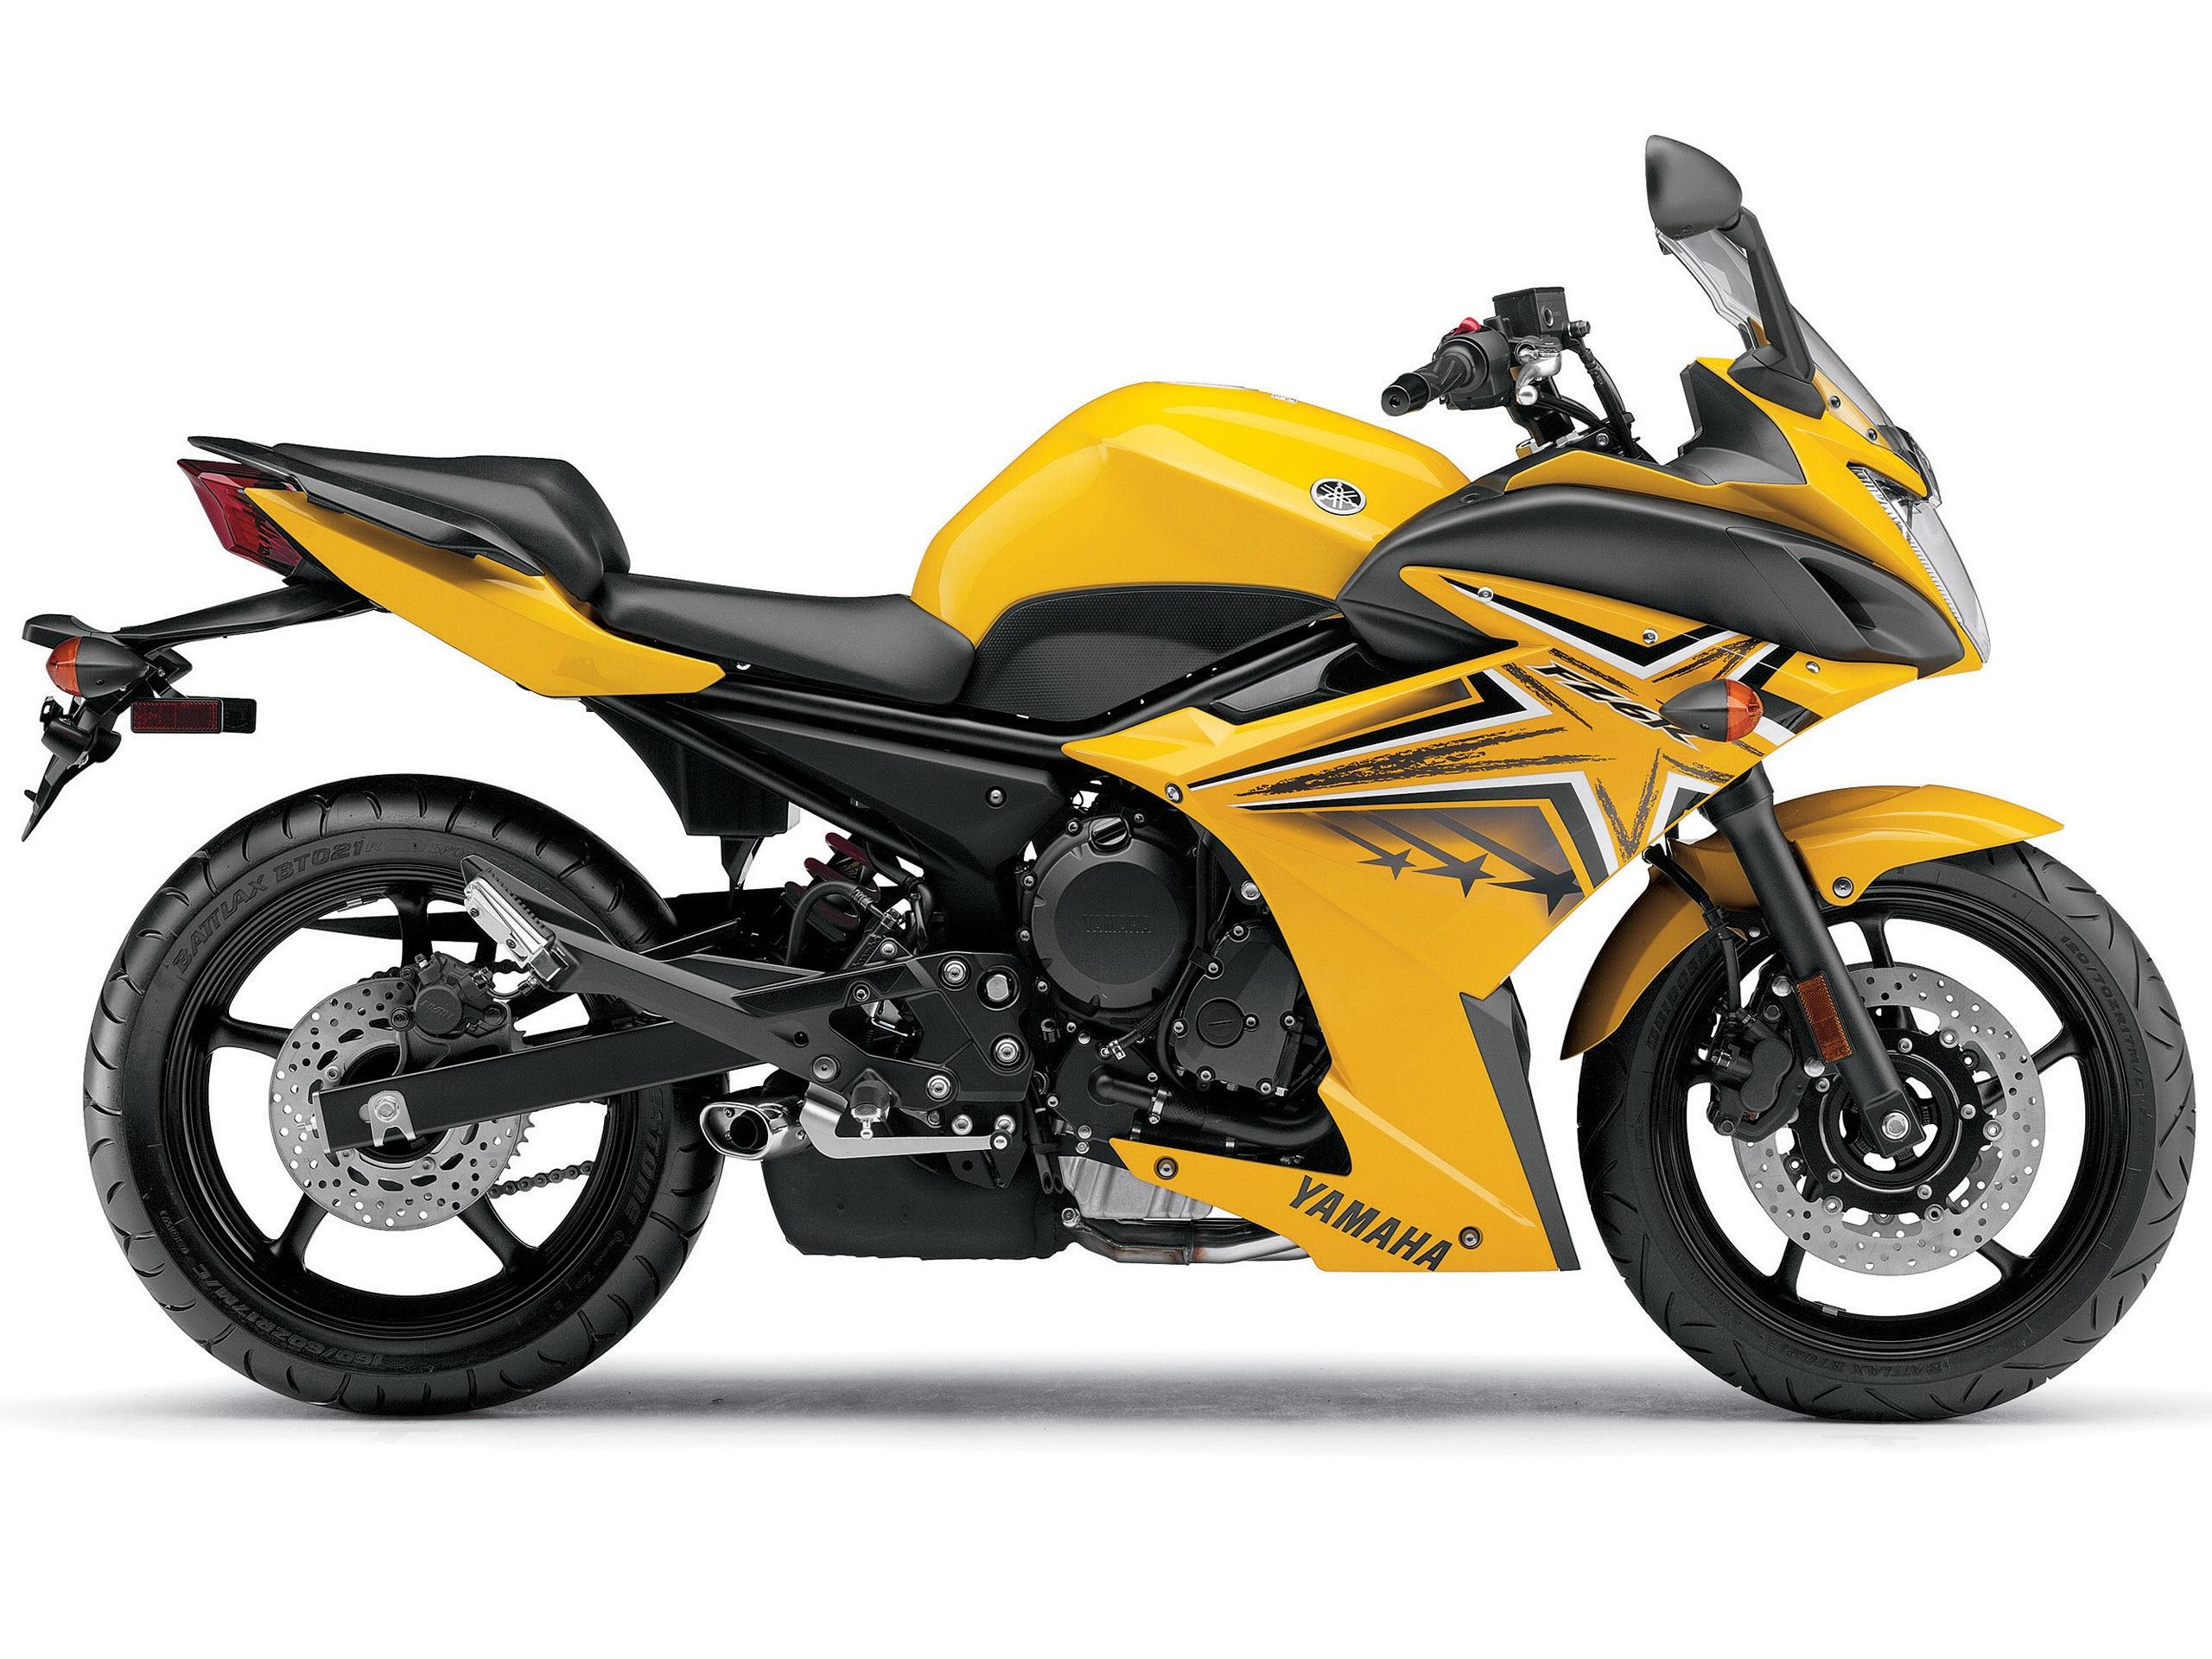 Yamaha fz6r yellow wallpapers and images wallpapers for 2014 yamaha fz6r